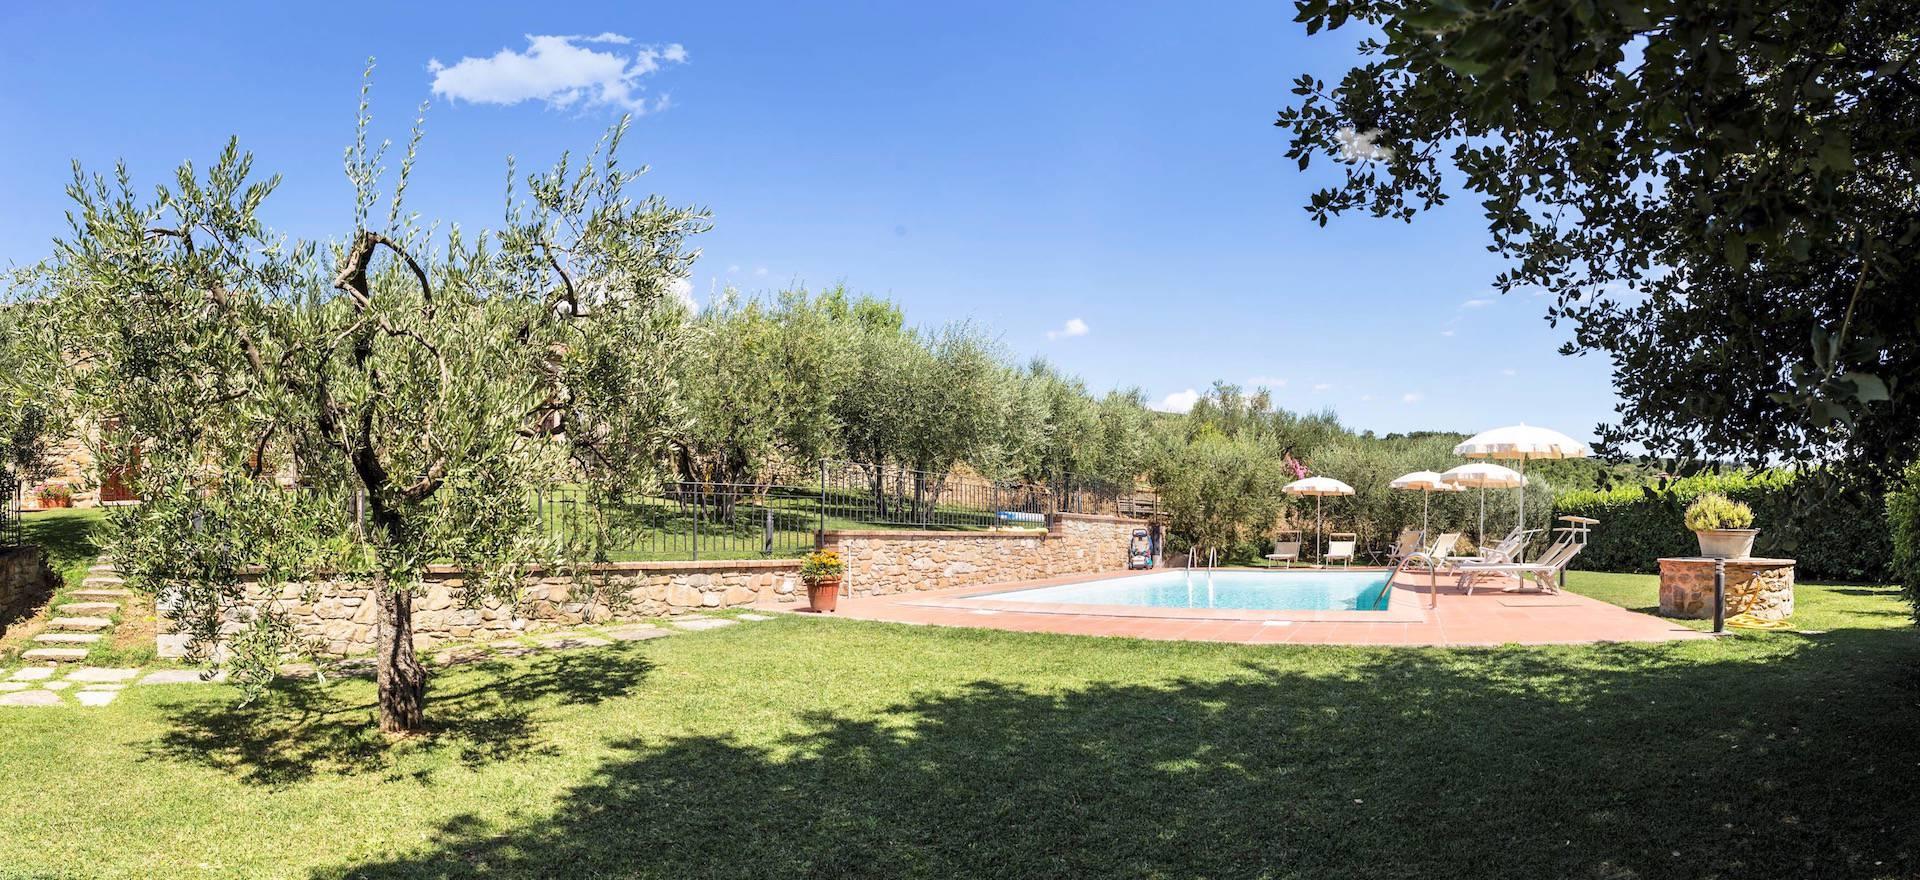 Agriturismo Toscane Gastvrije agriturismo niet ver van Cortona